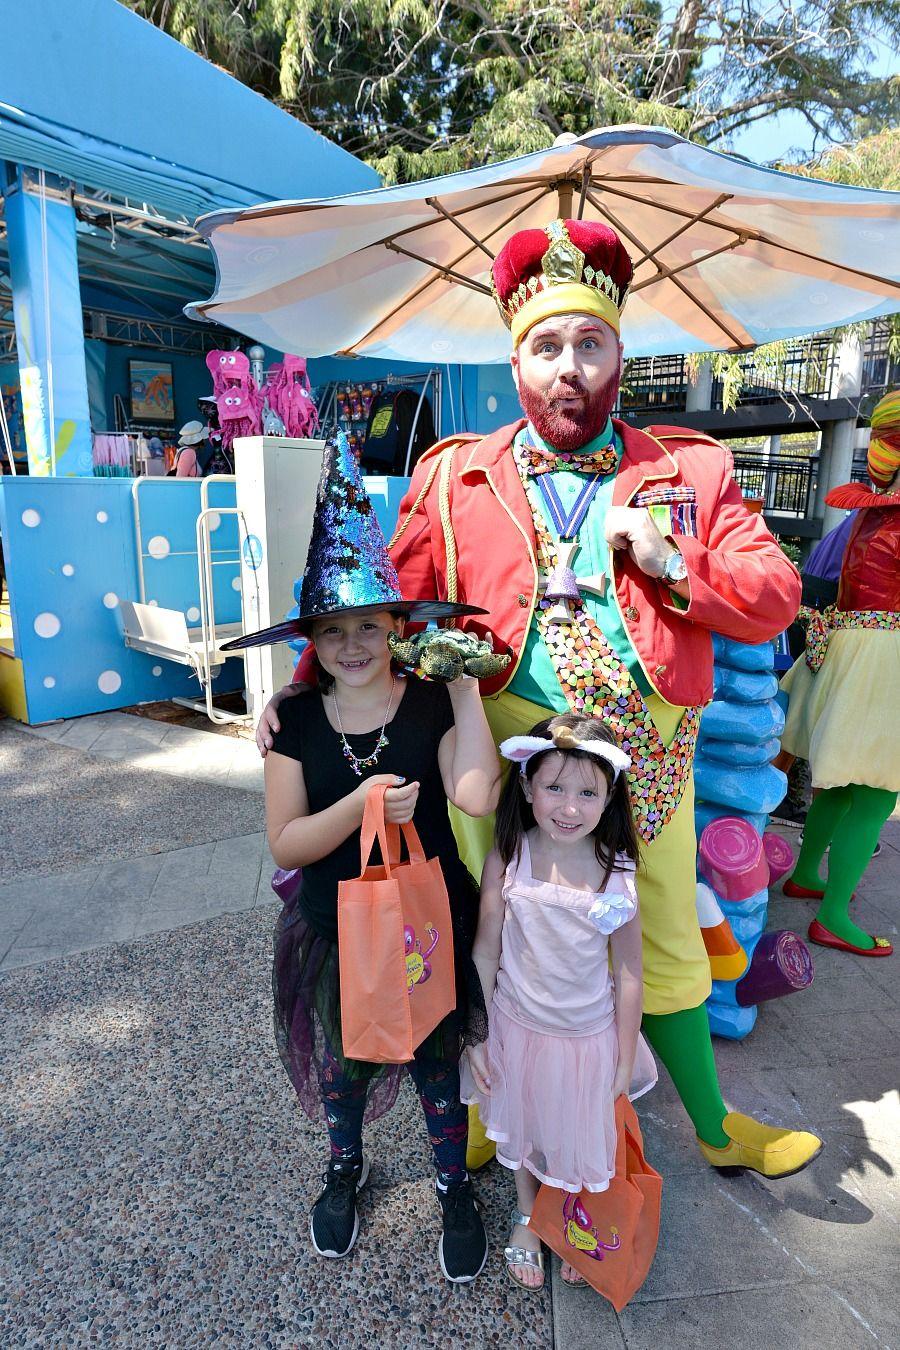 SeaWorld's Spooktacular KidFriendly Halloween Event in